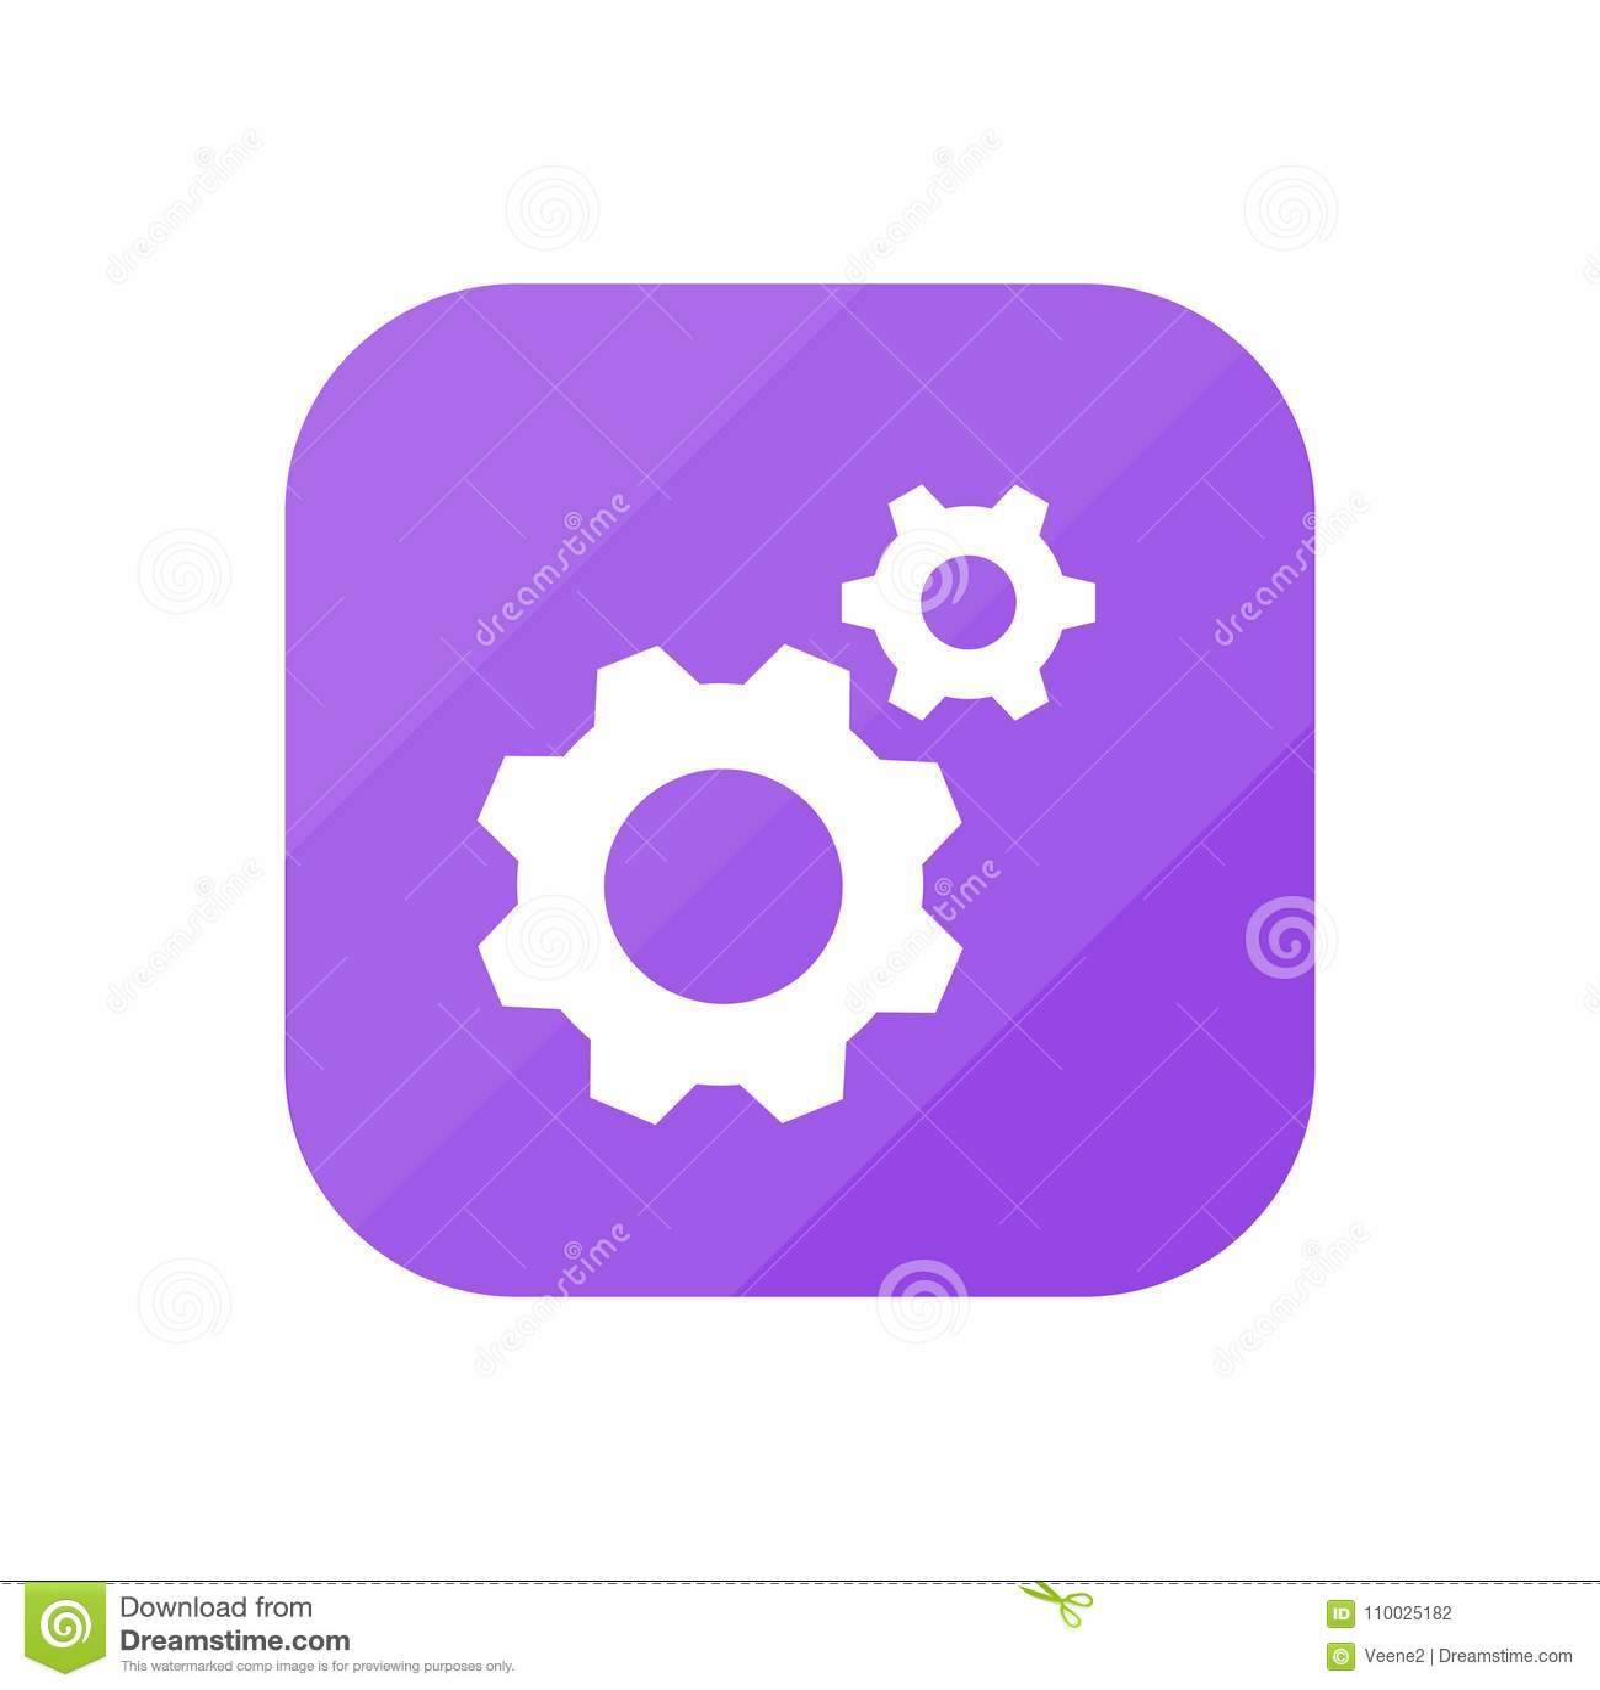 Radertjewiel - App Pictogram